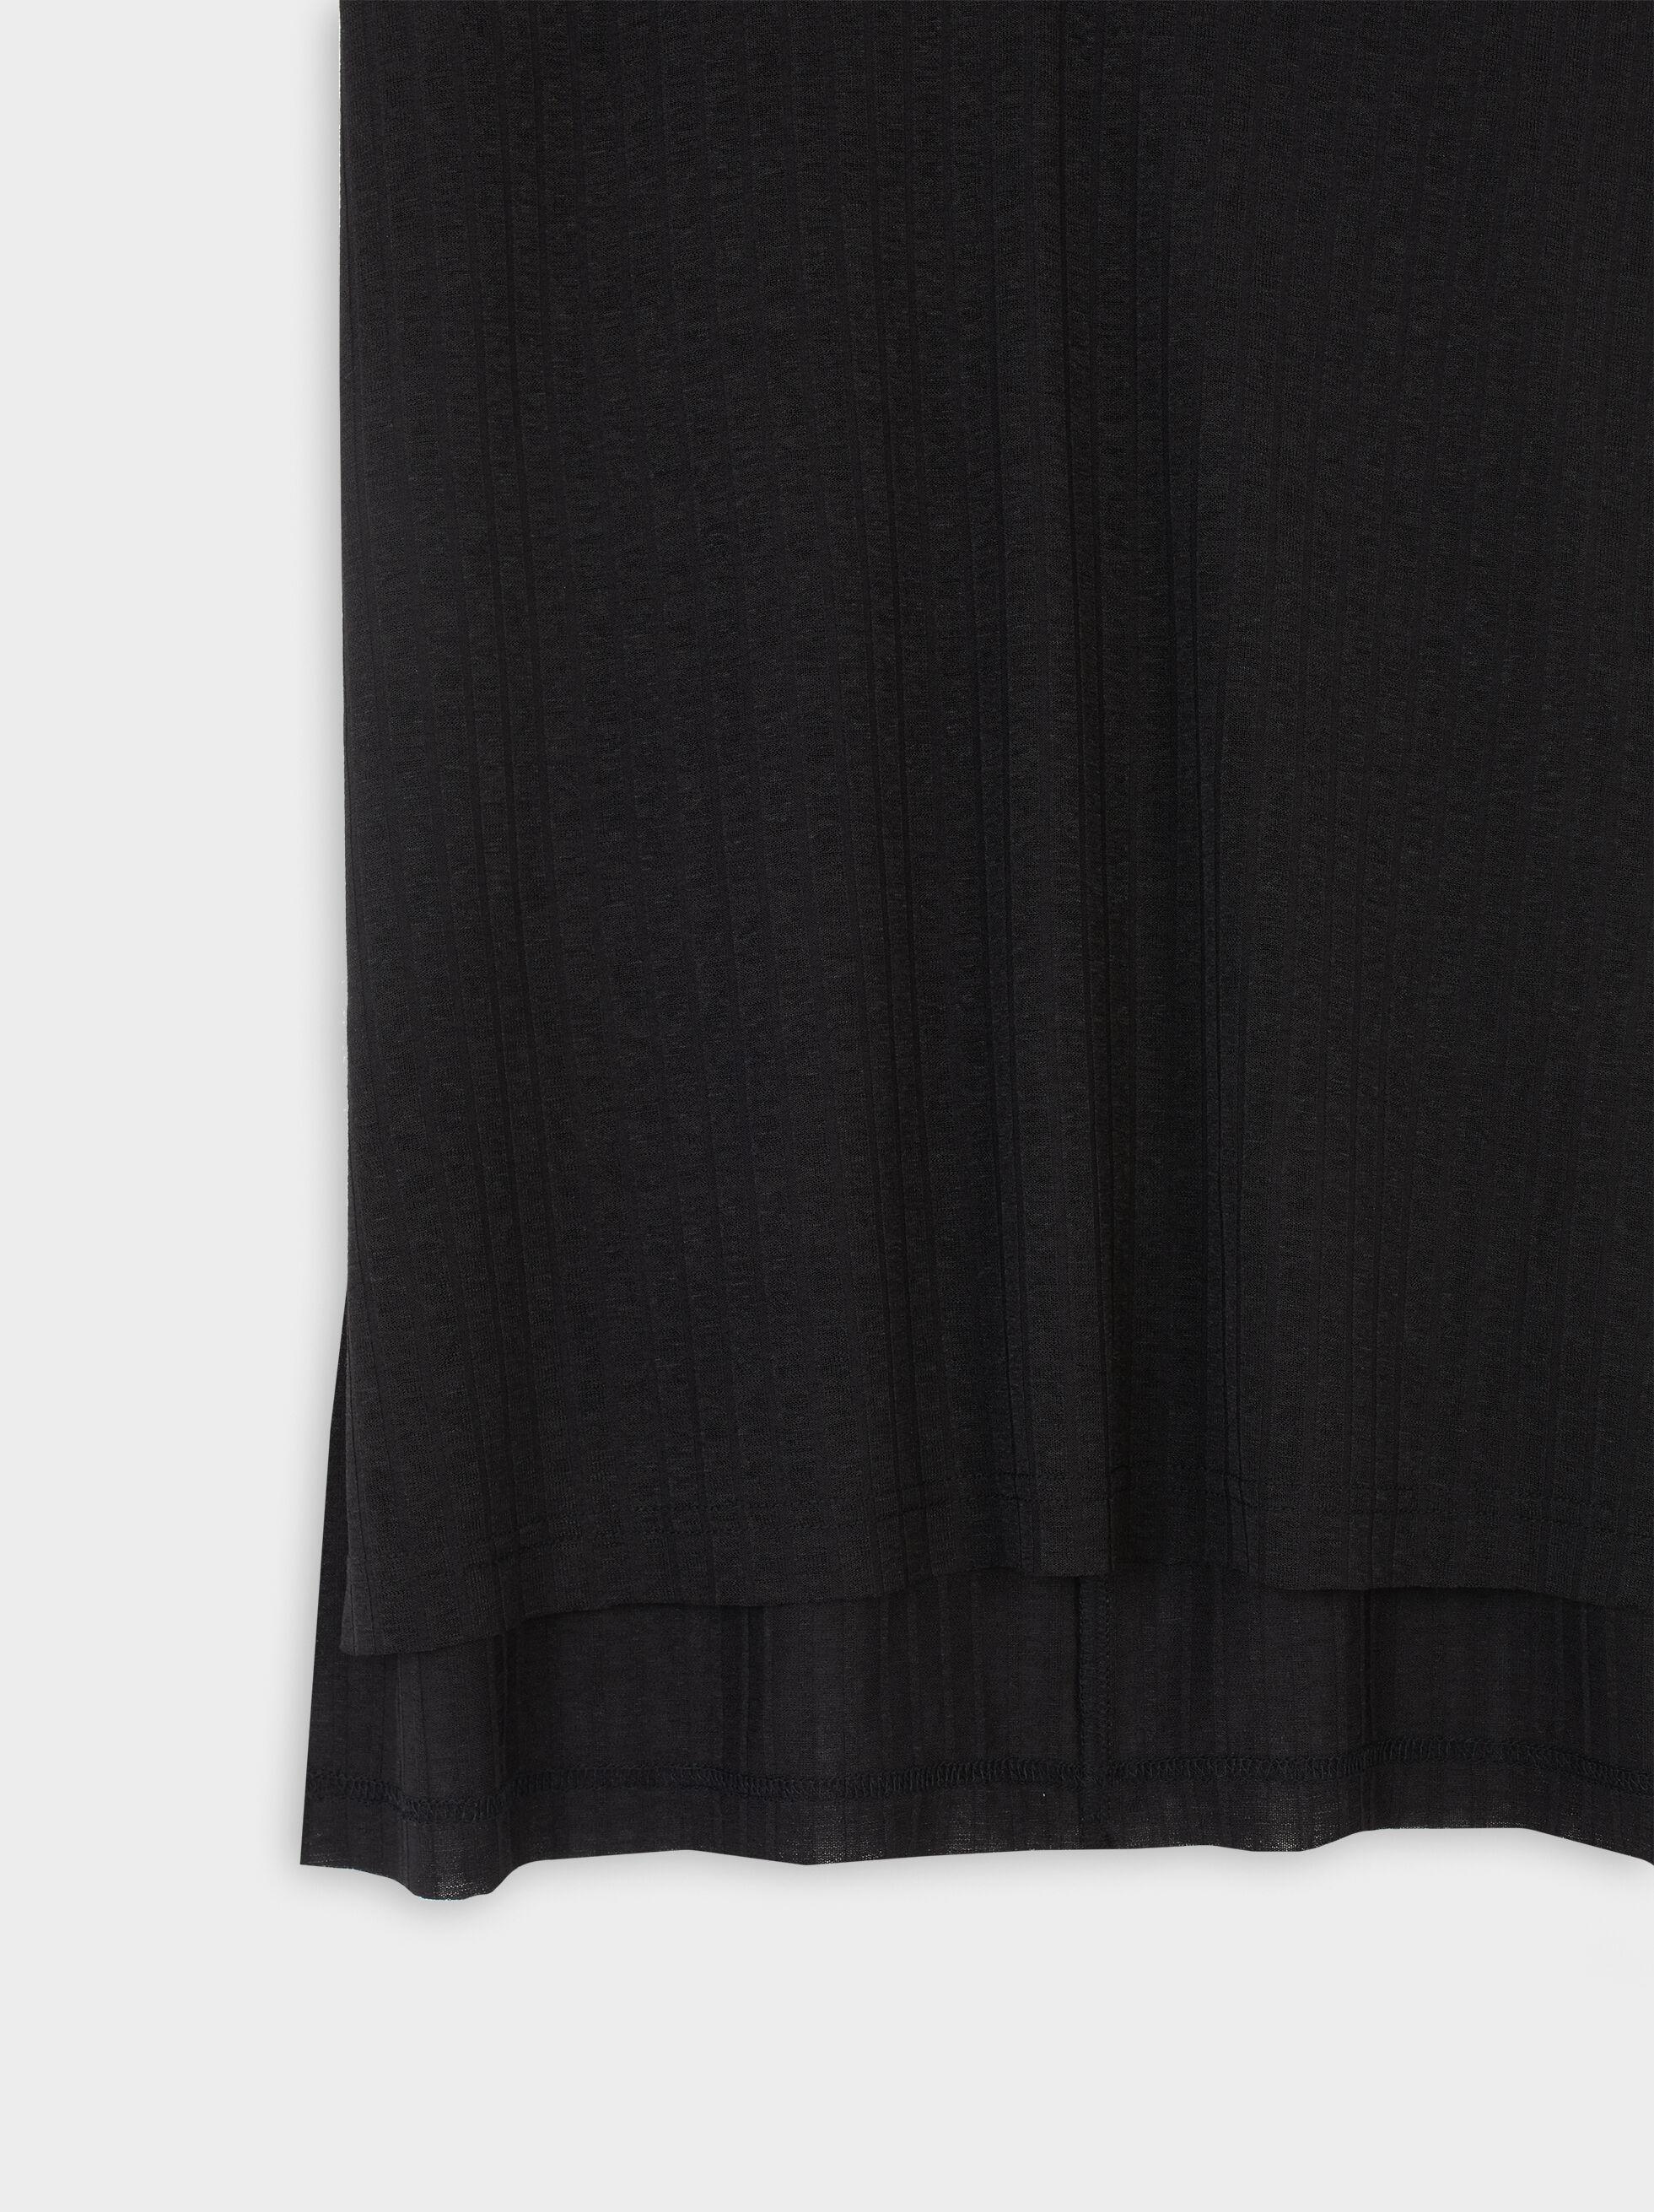 Sleeveless V-Neck Top, Black, hi-res